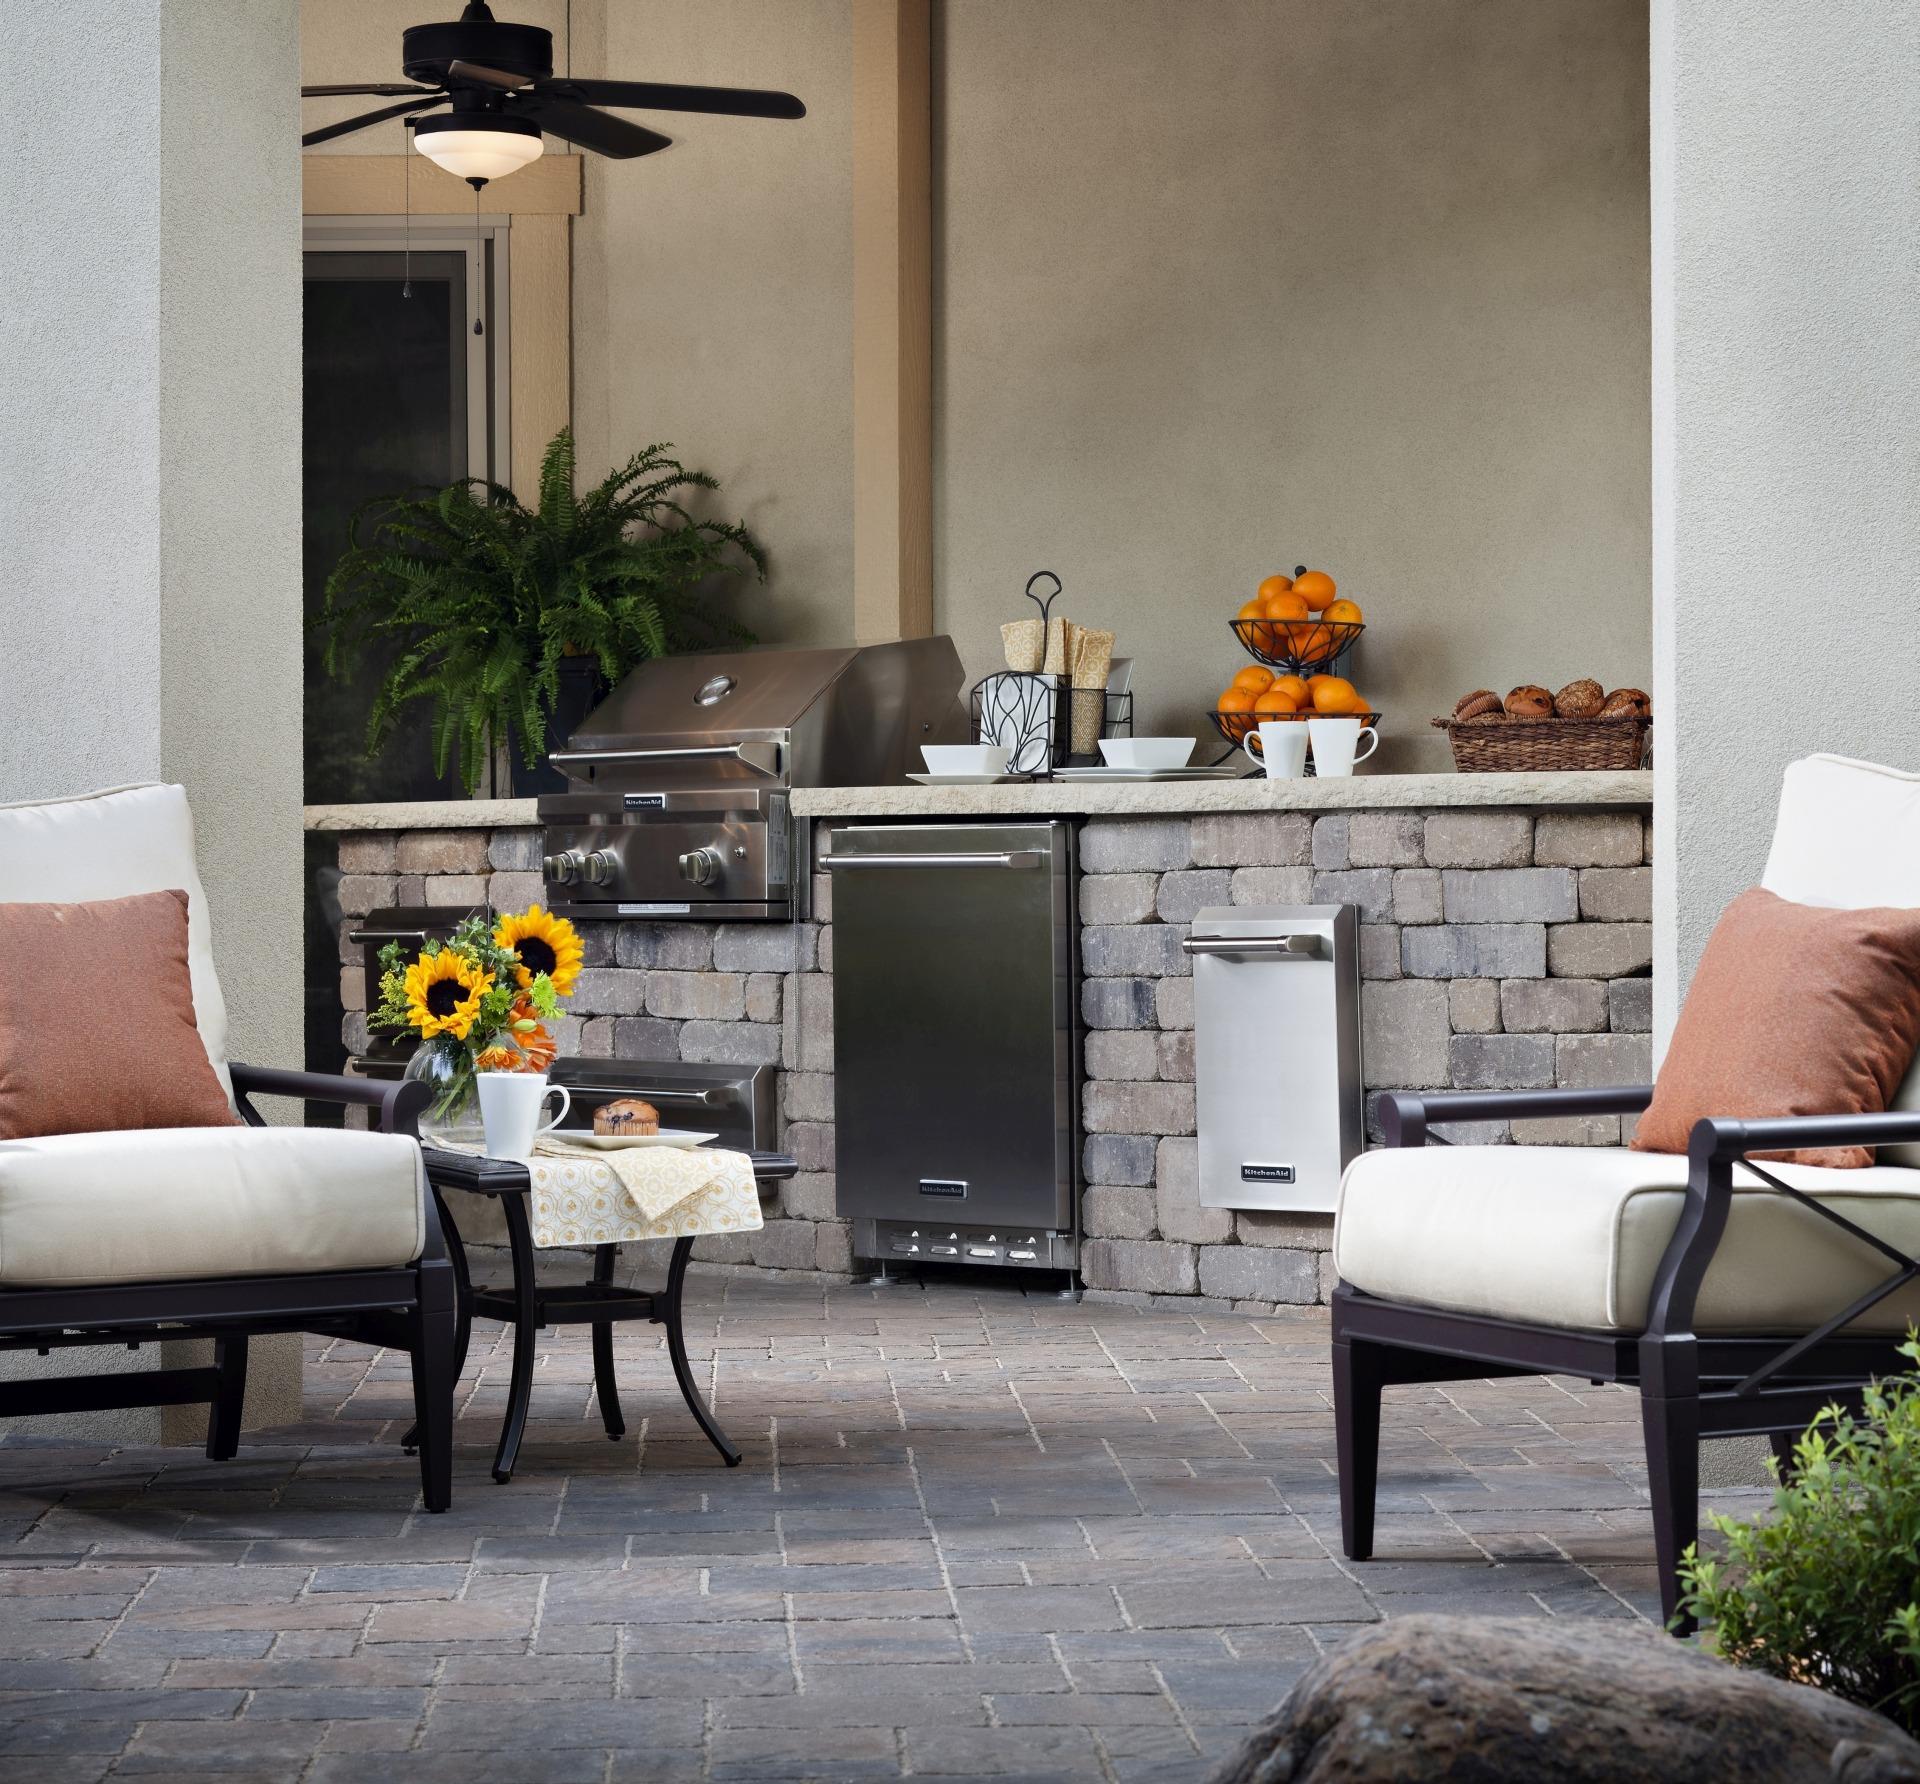 Paving Stone Outdoor Kitchen